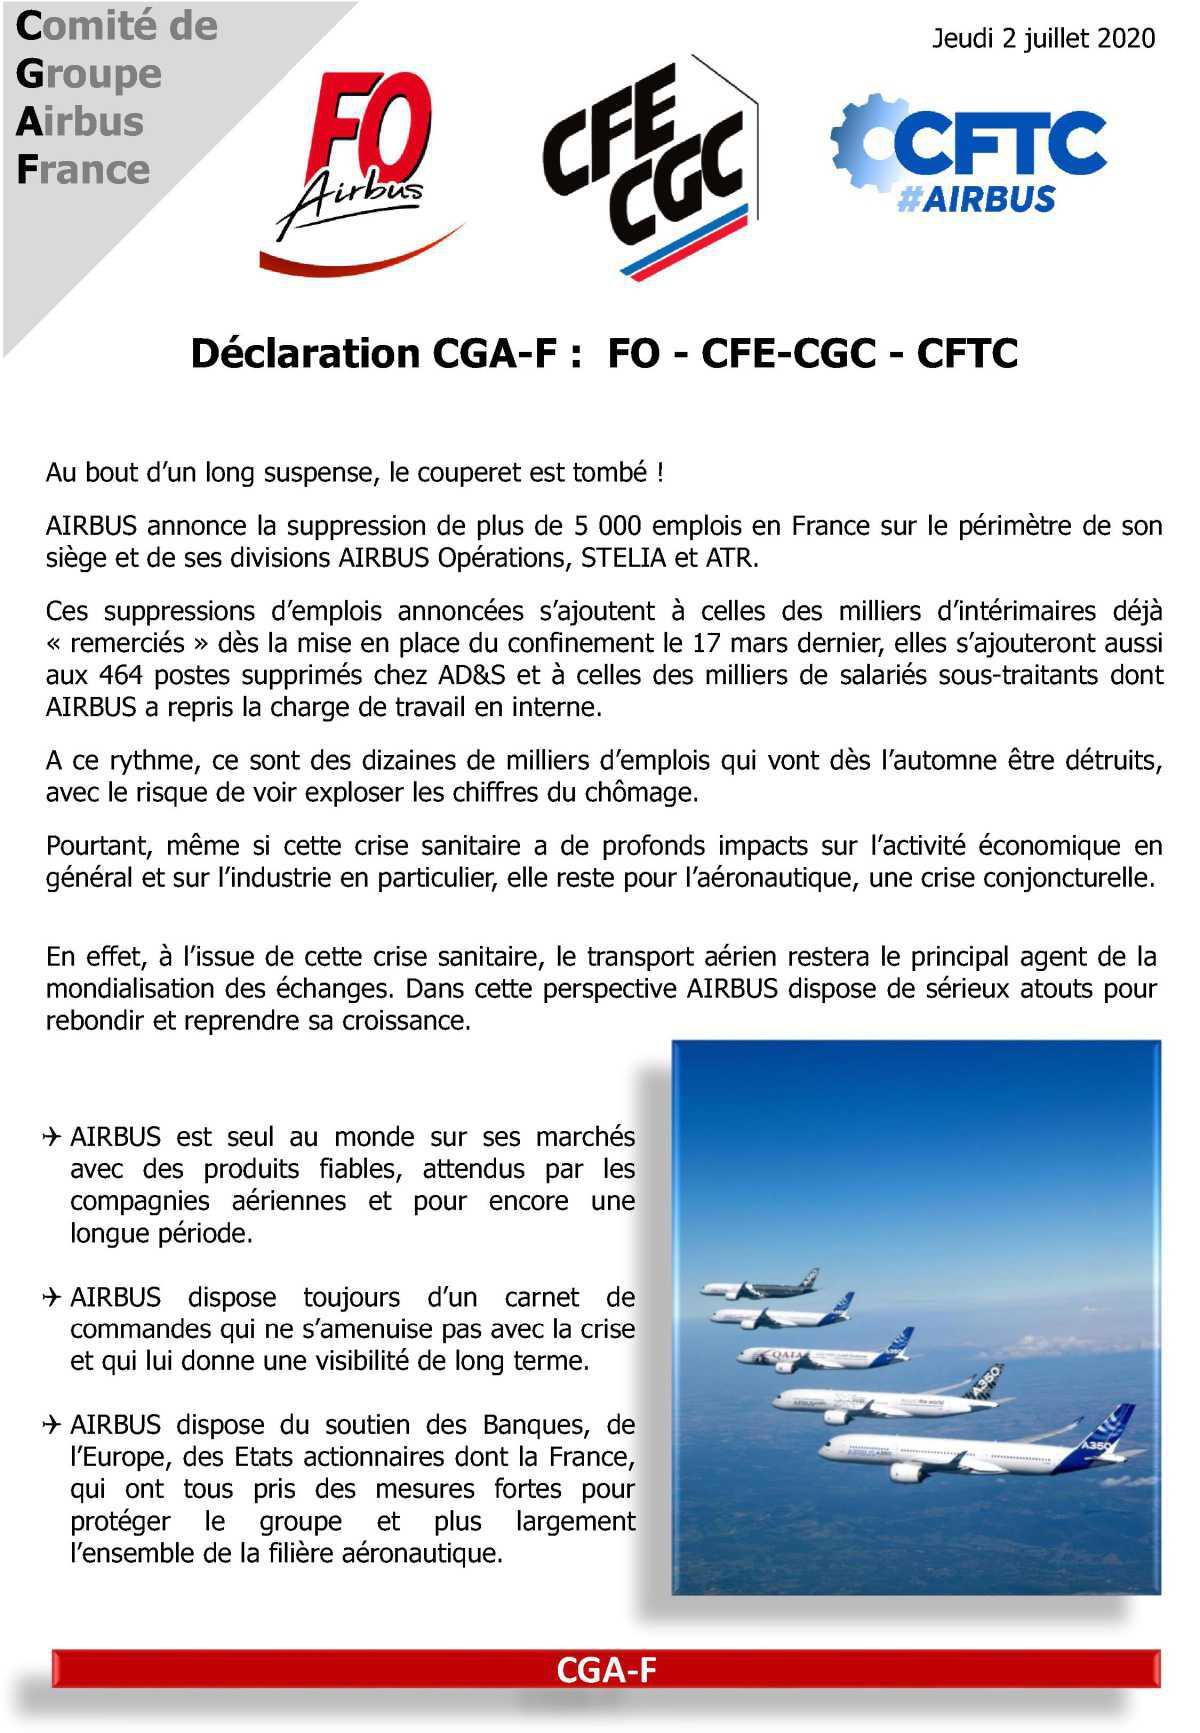 CGA-F du 2 Juillet